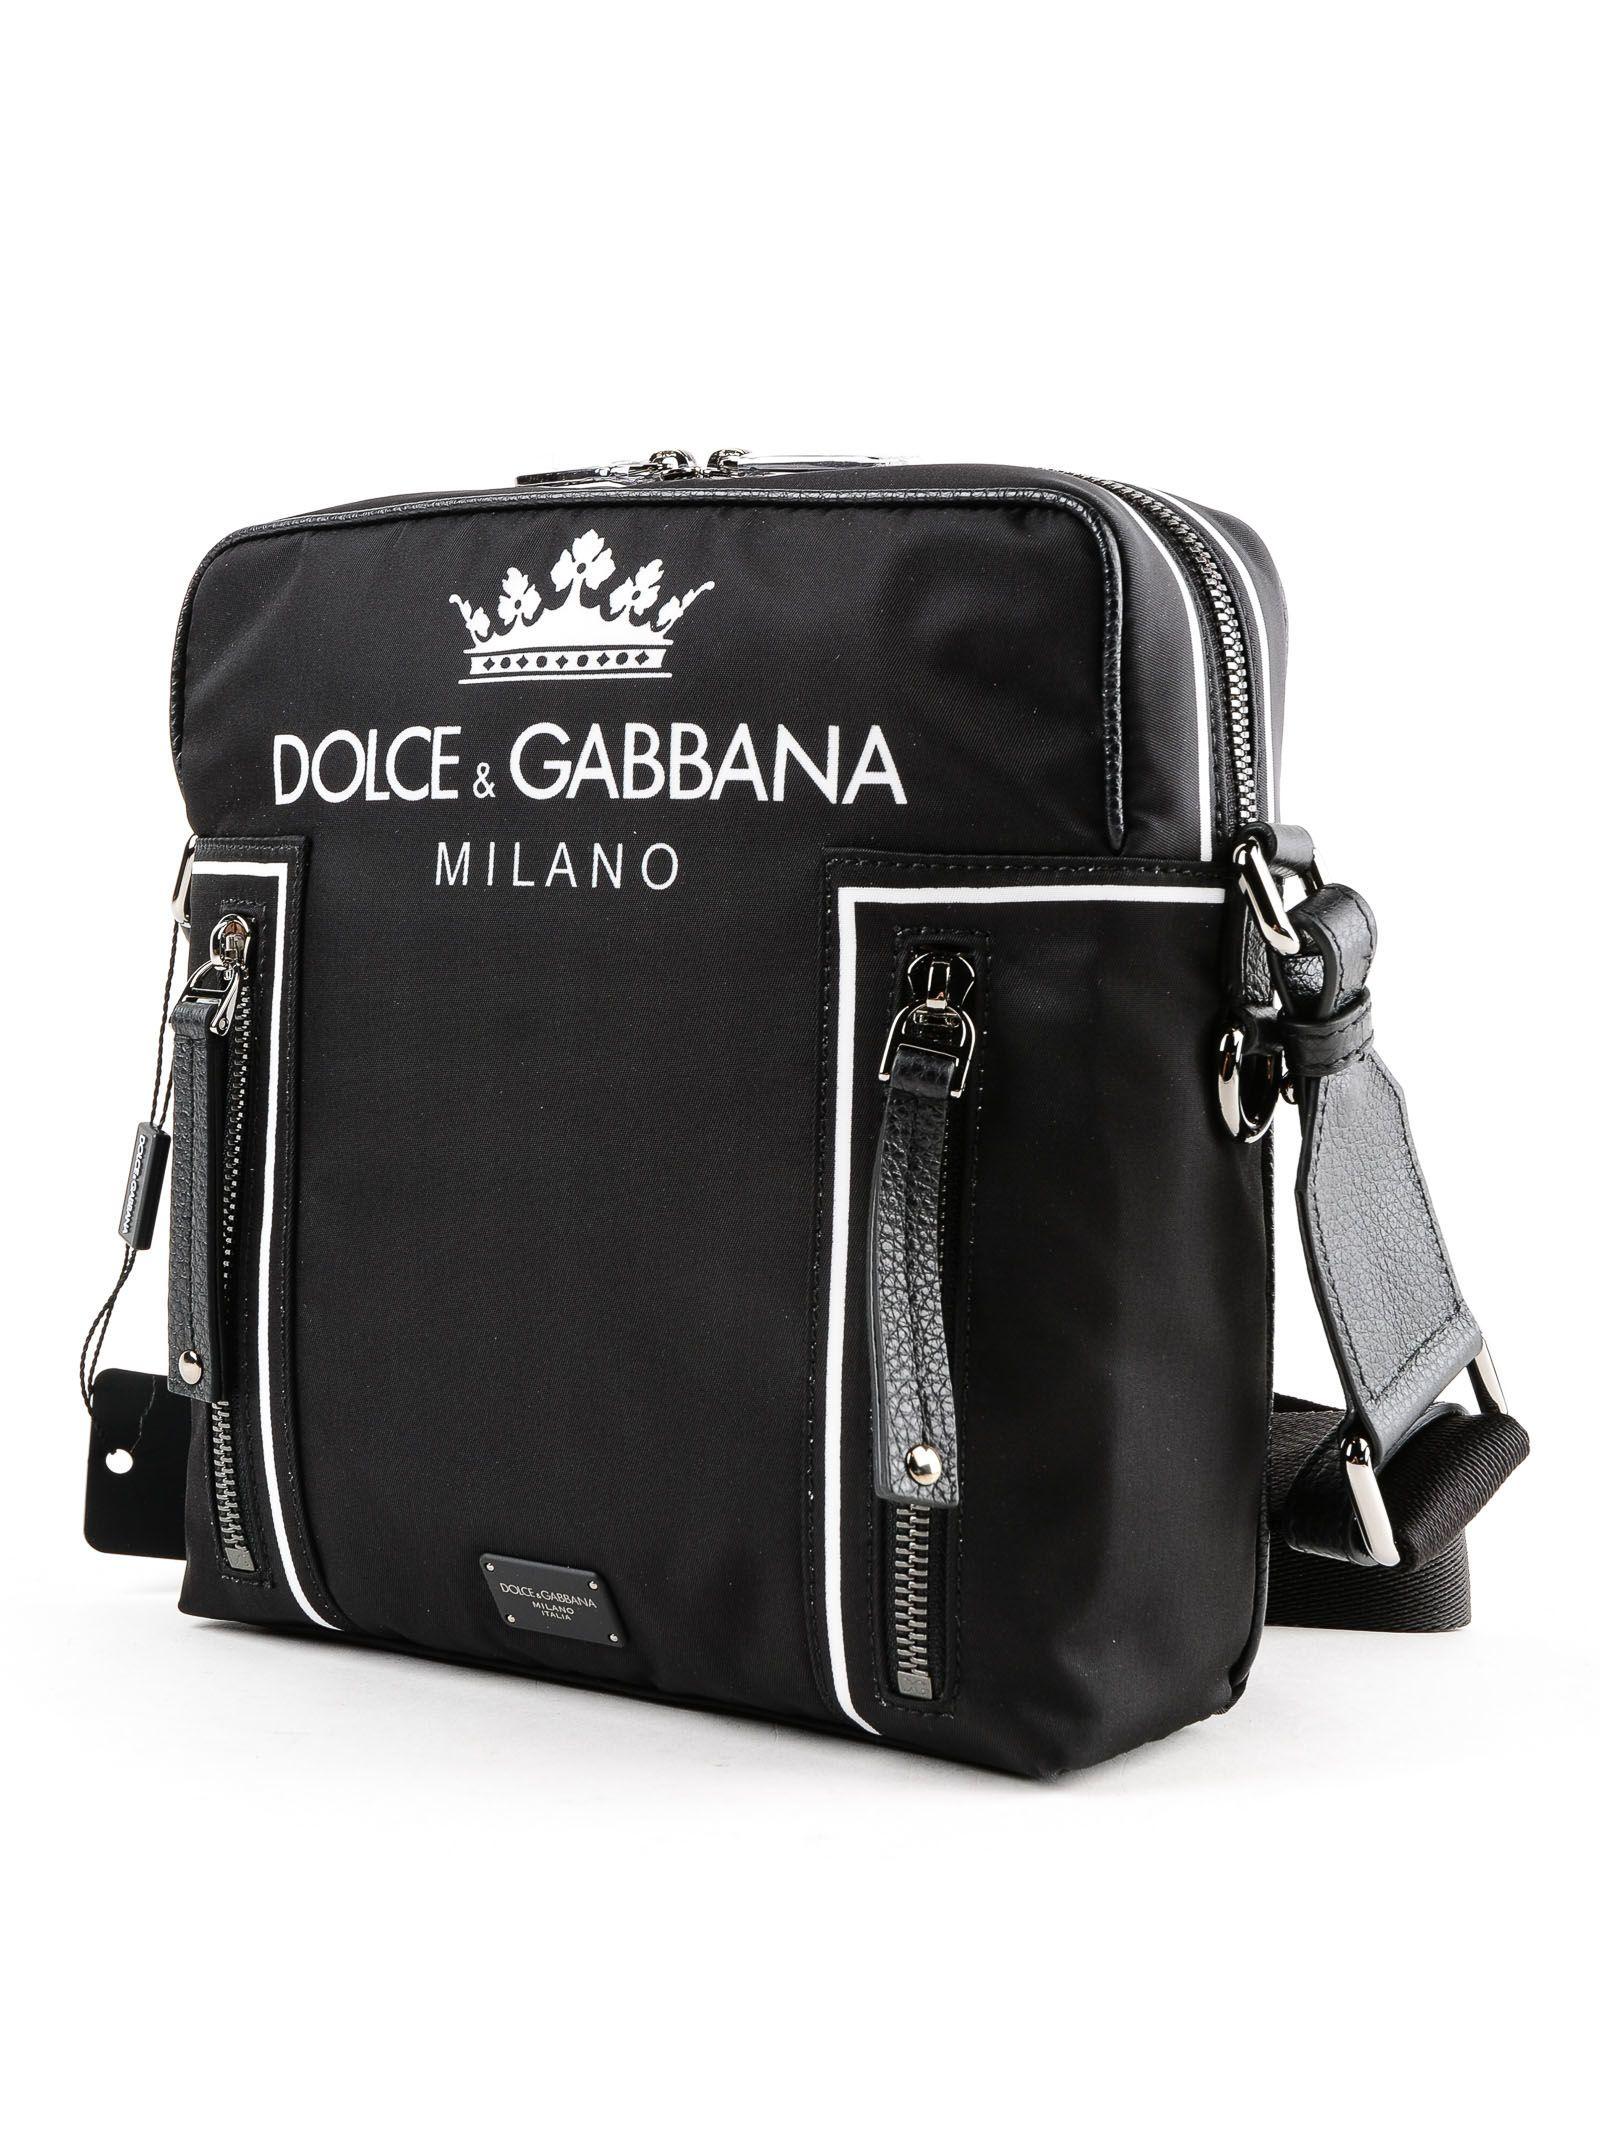 9bdc5e498ae Dolce & Gabbana Dolce & Gabbana Logo Print Crossbody Bag - Black ...